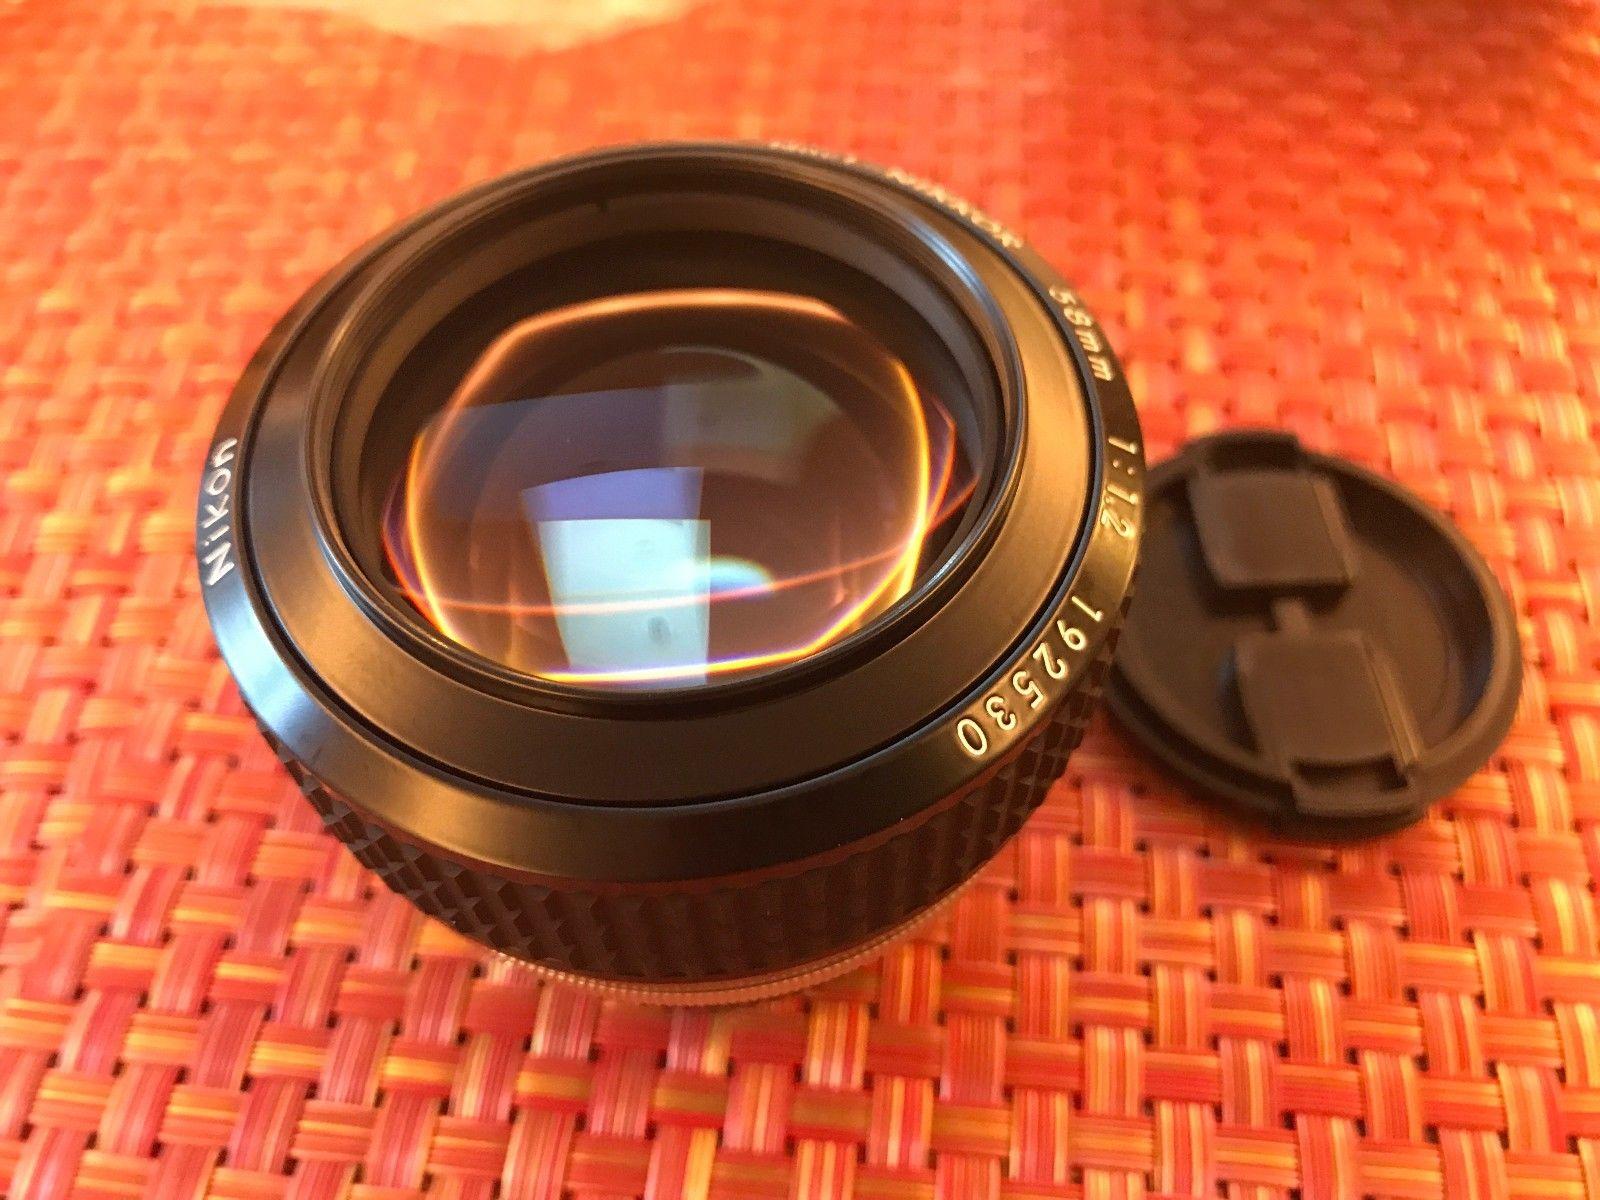 Nikon Noct-Nikkor 58mm f/1.2, вид спереди